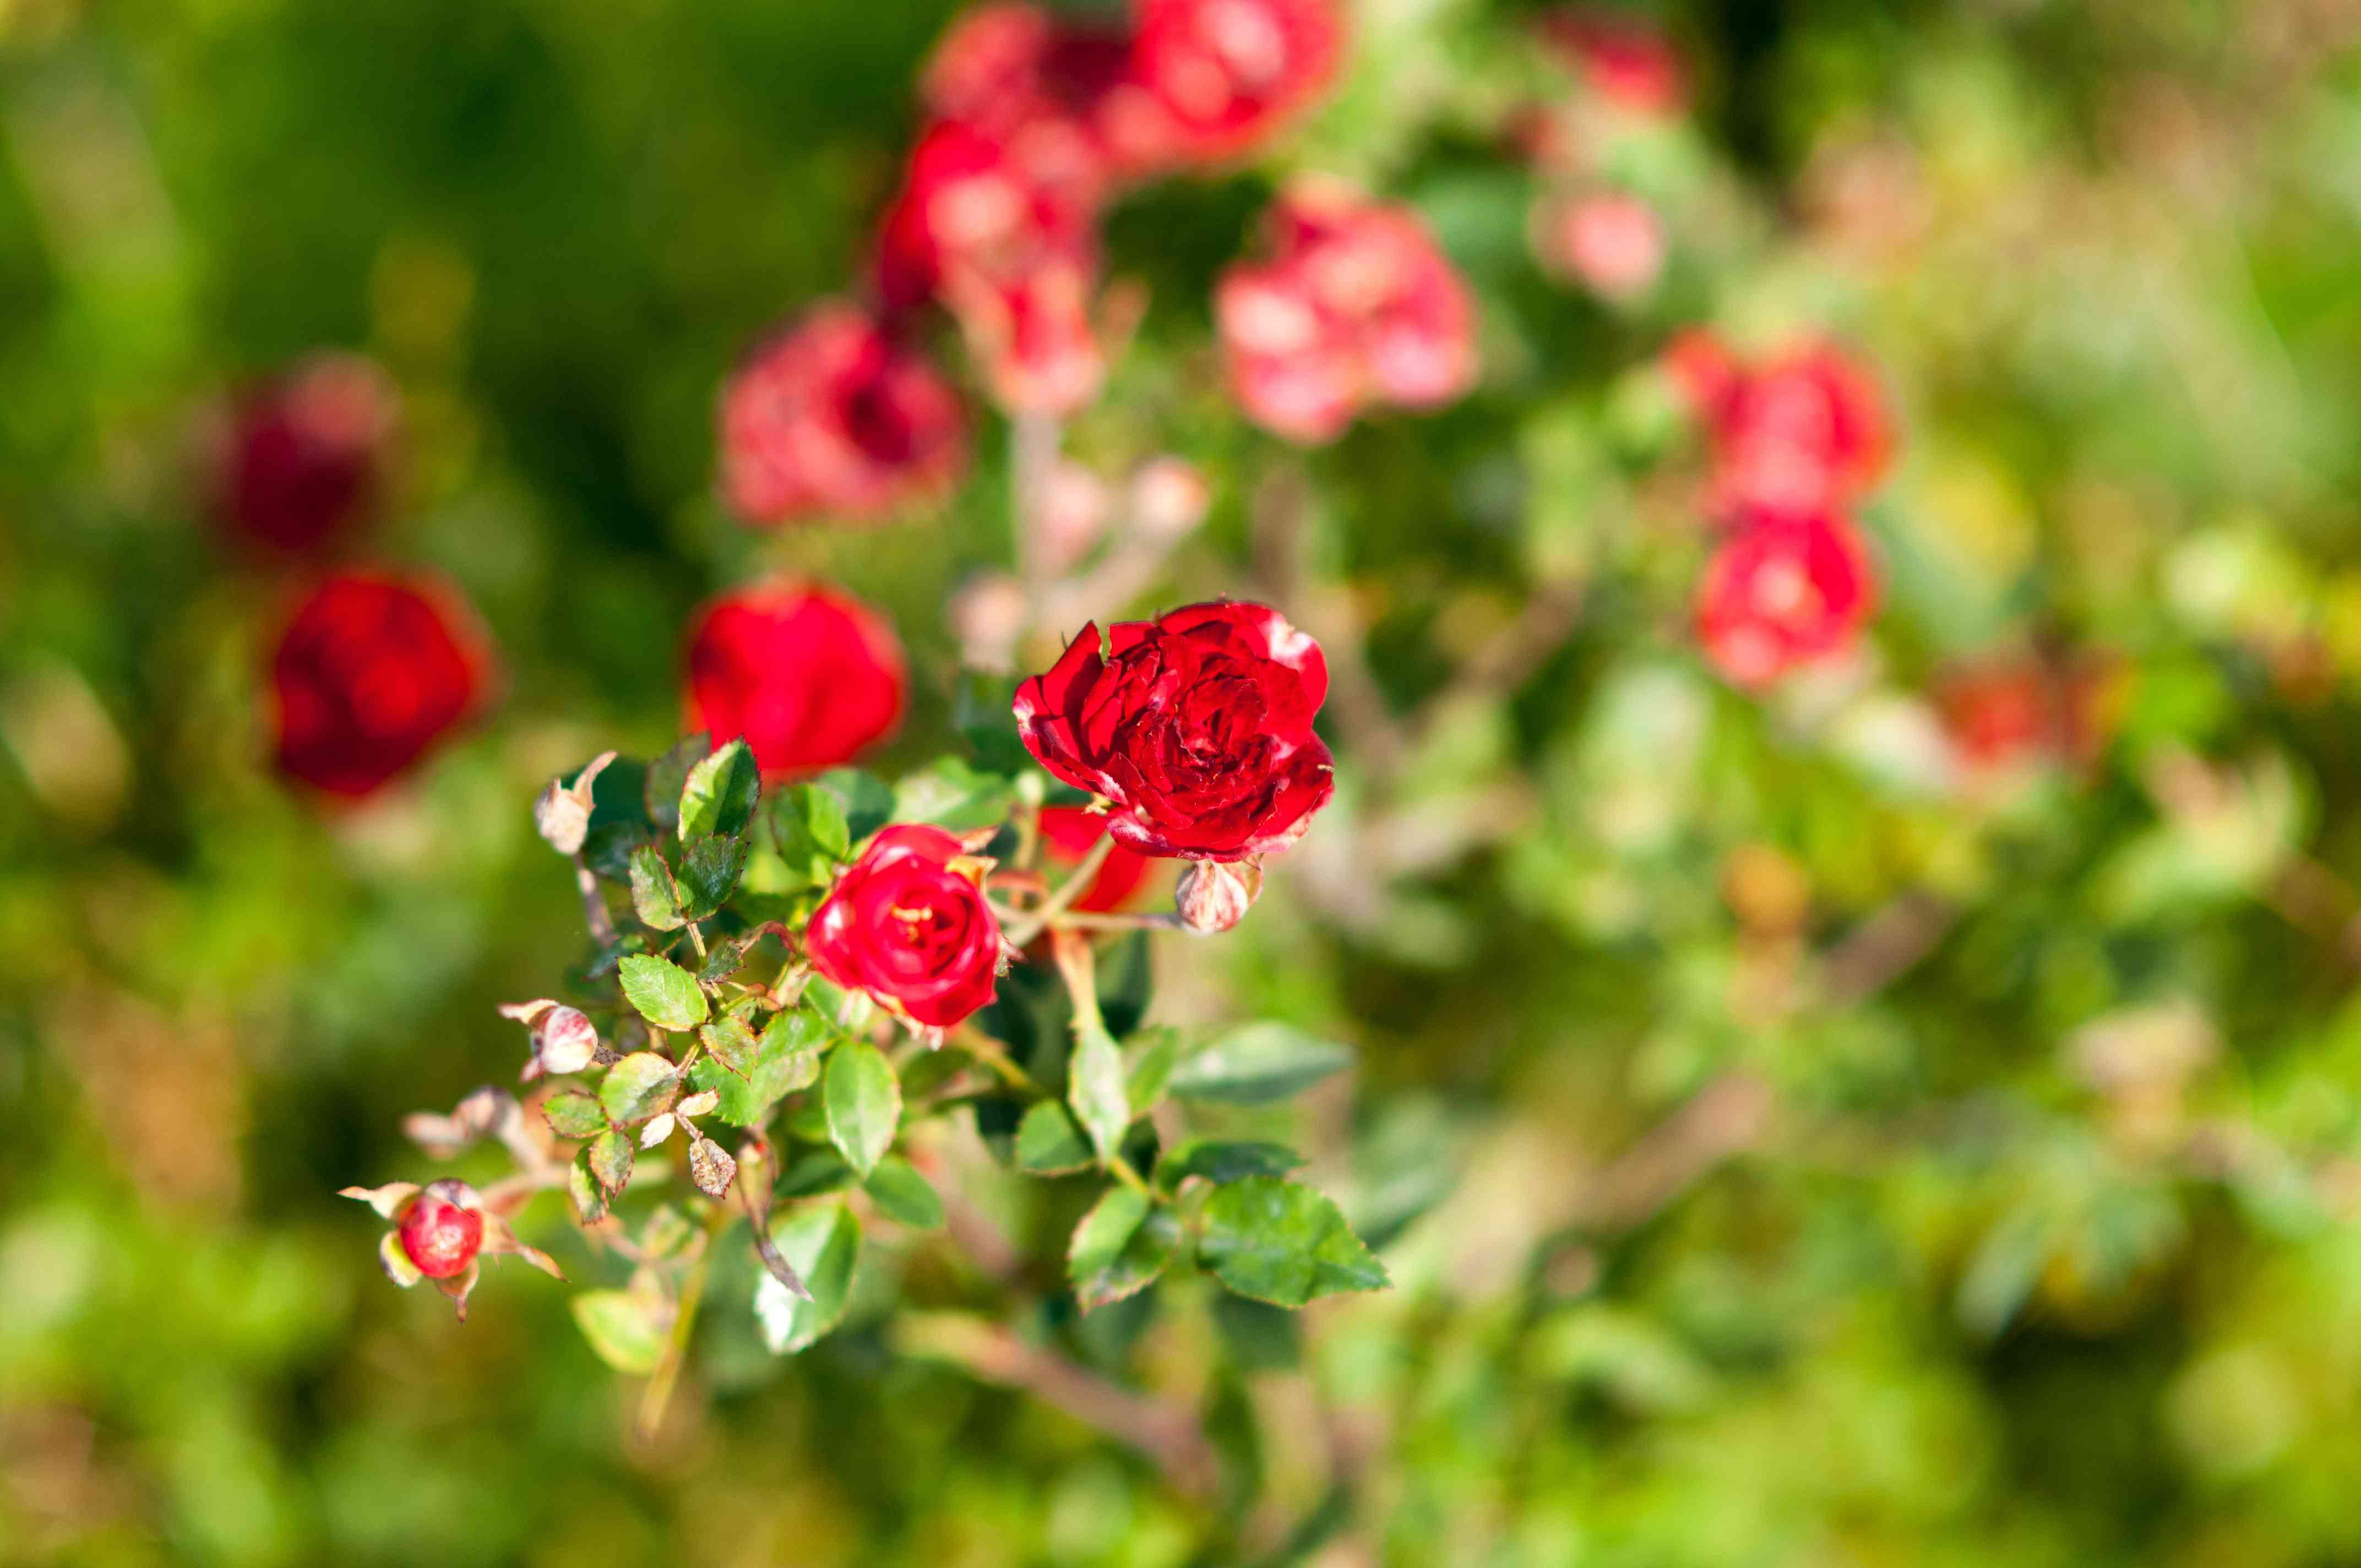 Rosa chinensis 'Minima'. Miniature red roses bush